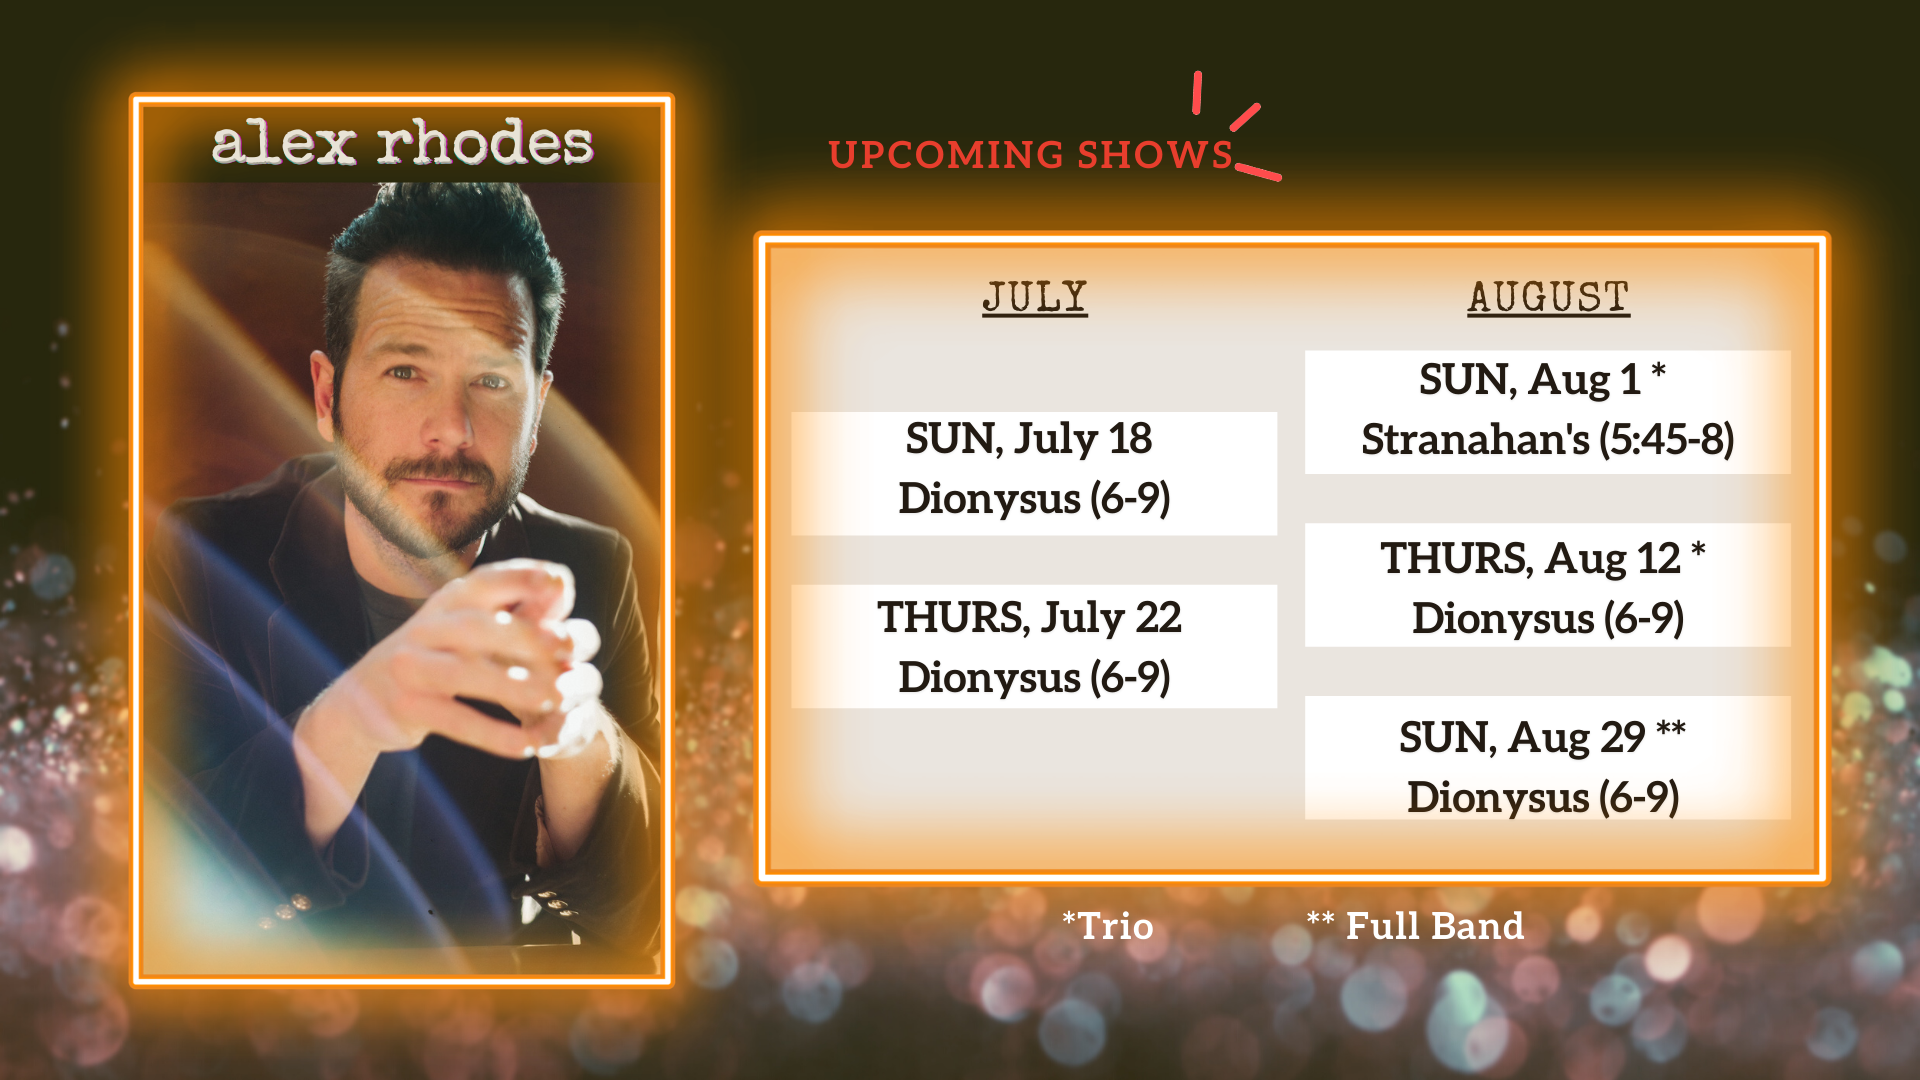 Upcoming Shows - Alex Rhodes Show